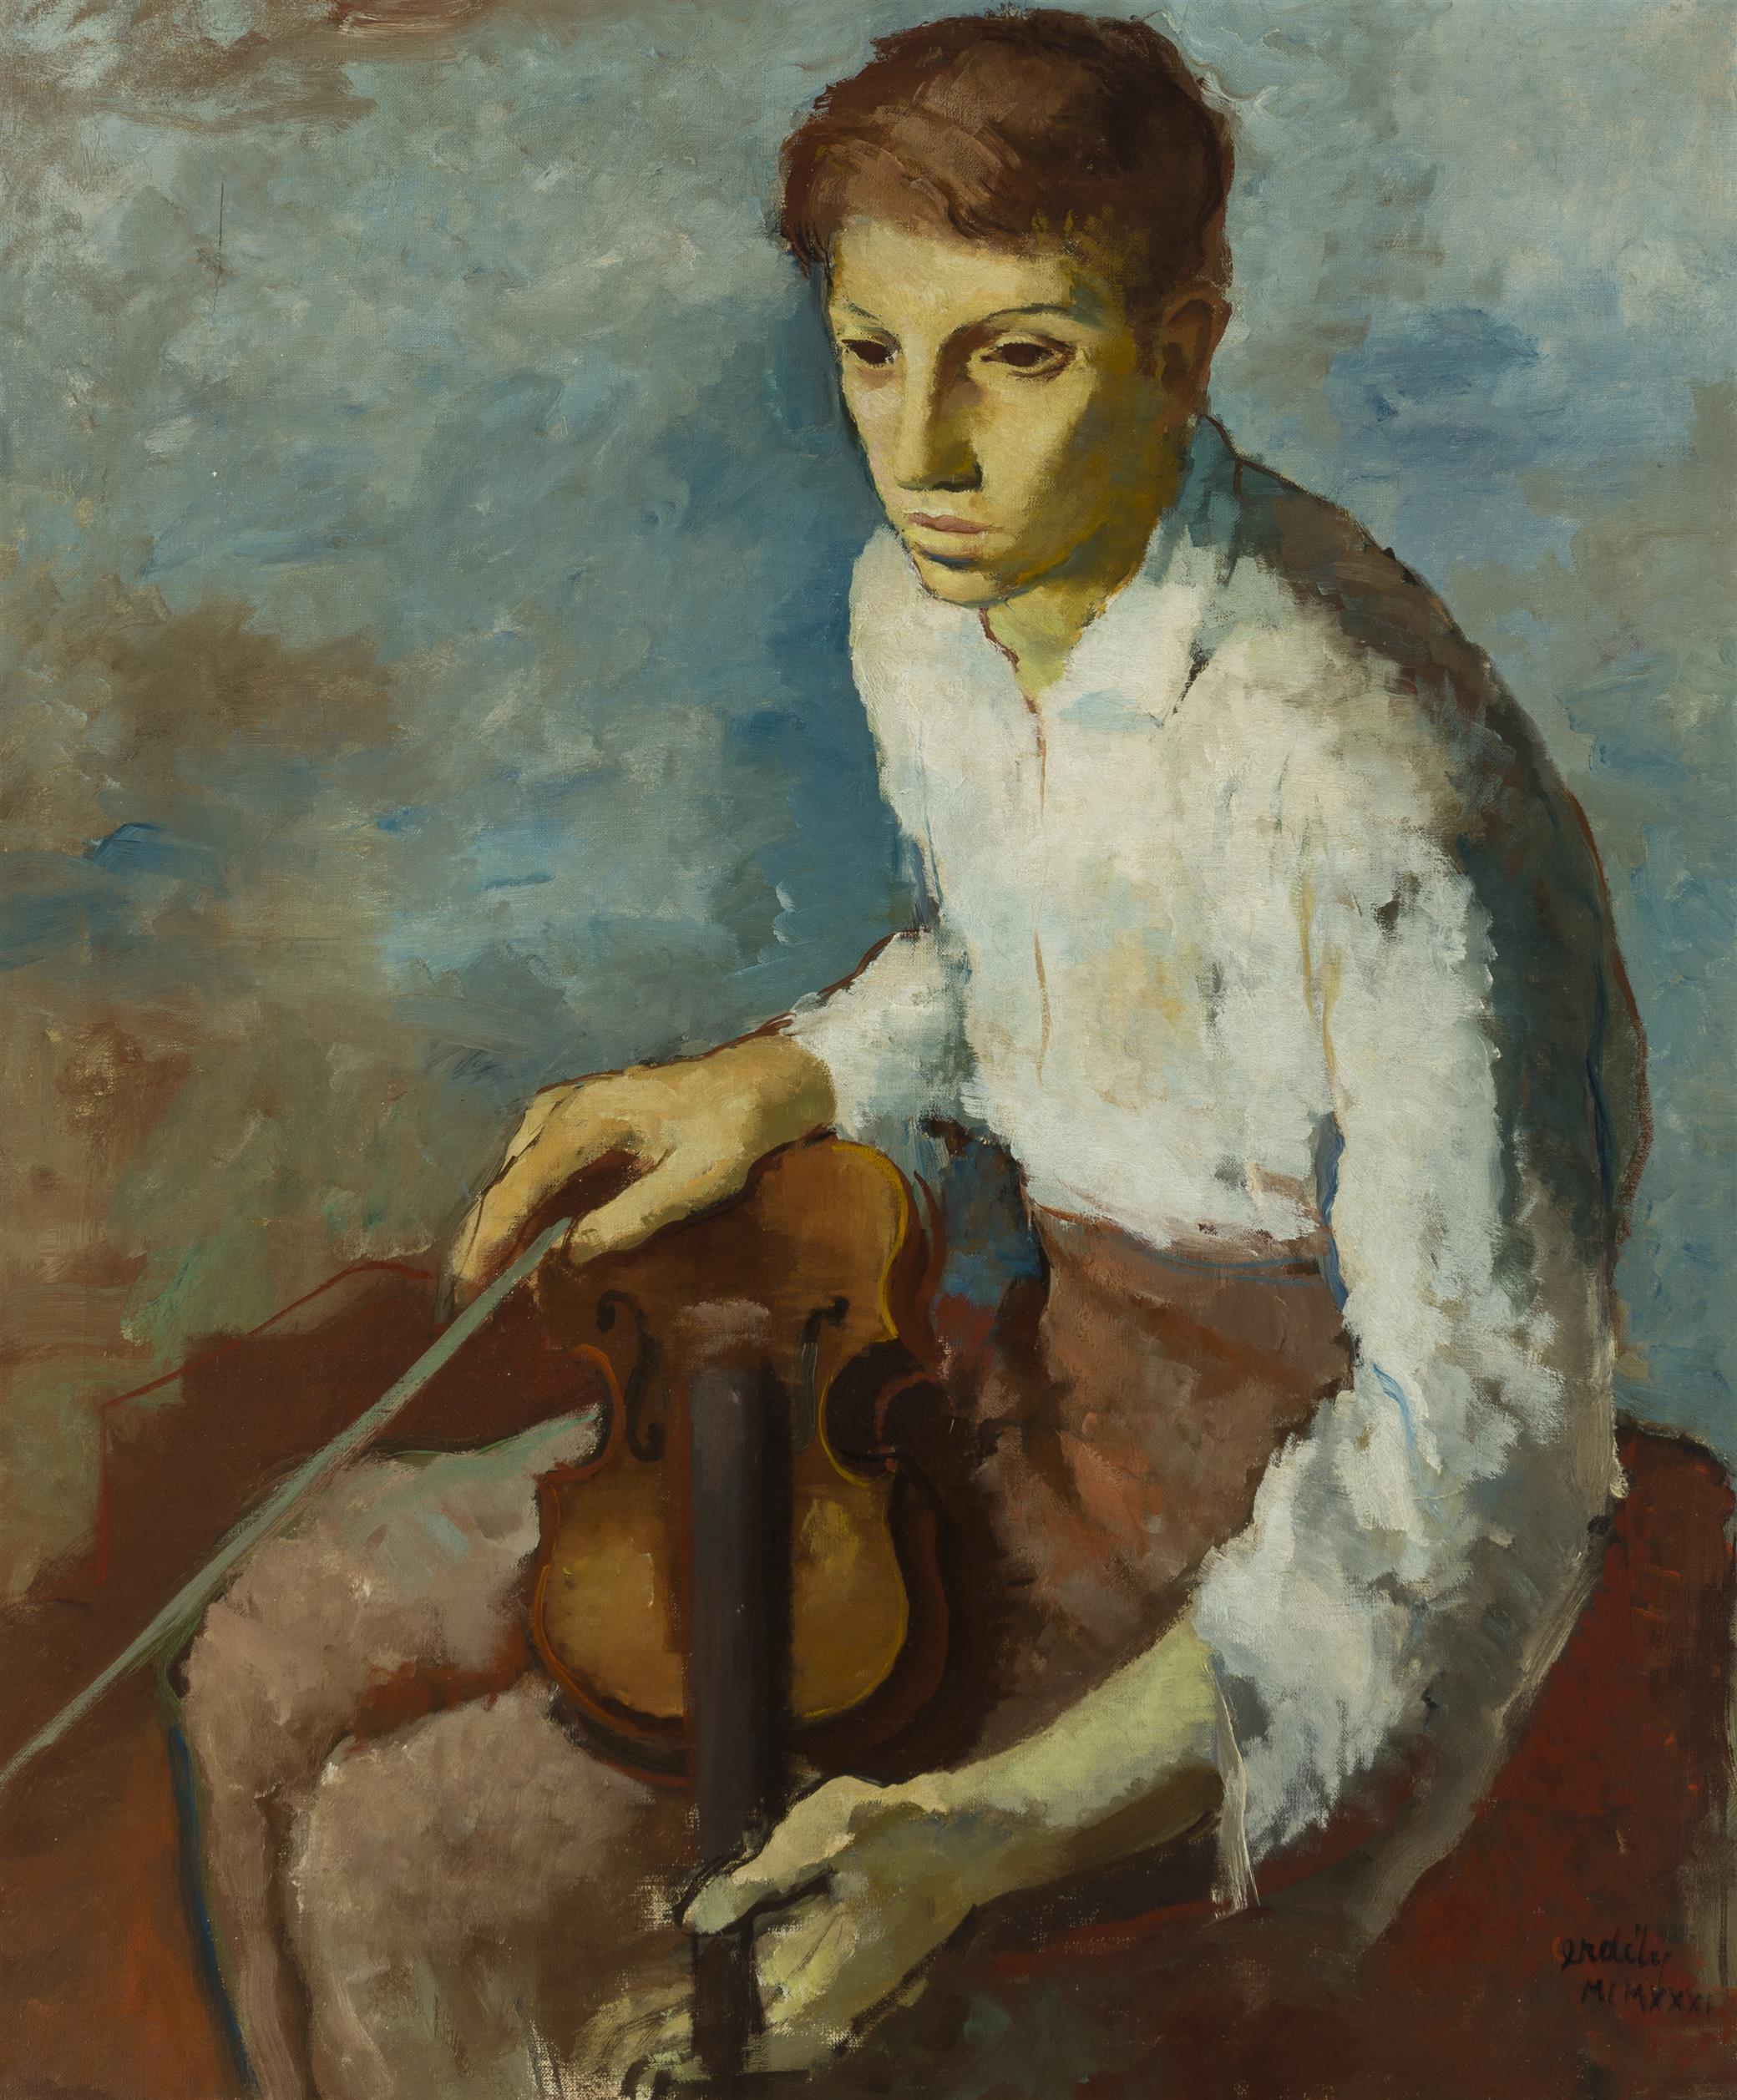 "Francis De Erdely, (1904-1959 Los Angeles, CA), Violin player, 1931, Oil on canvas, 35.5"" H x 29.5"" W"